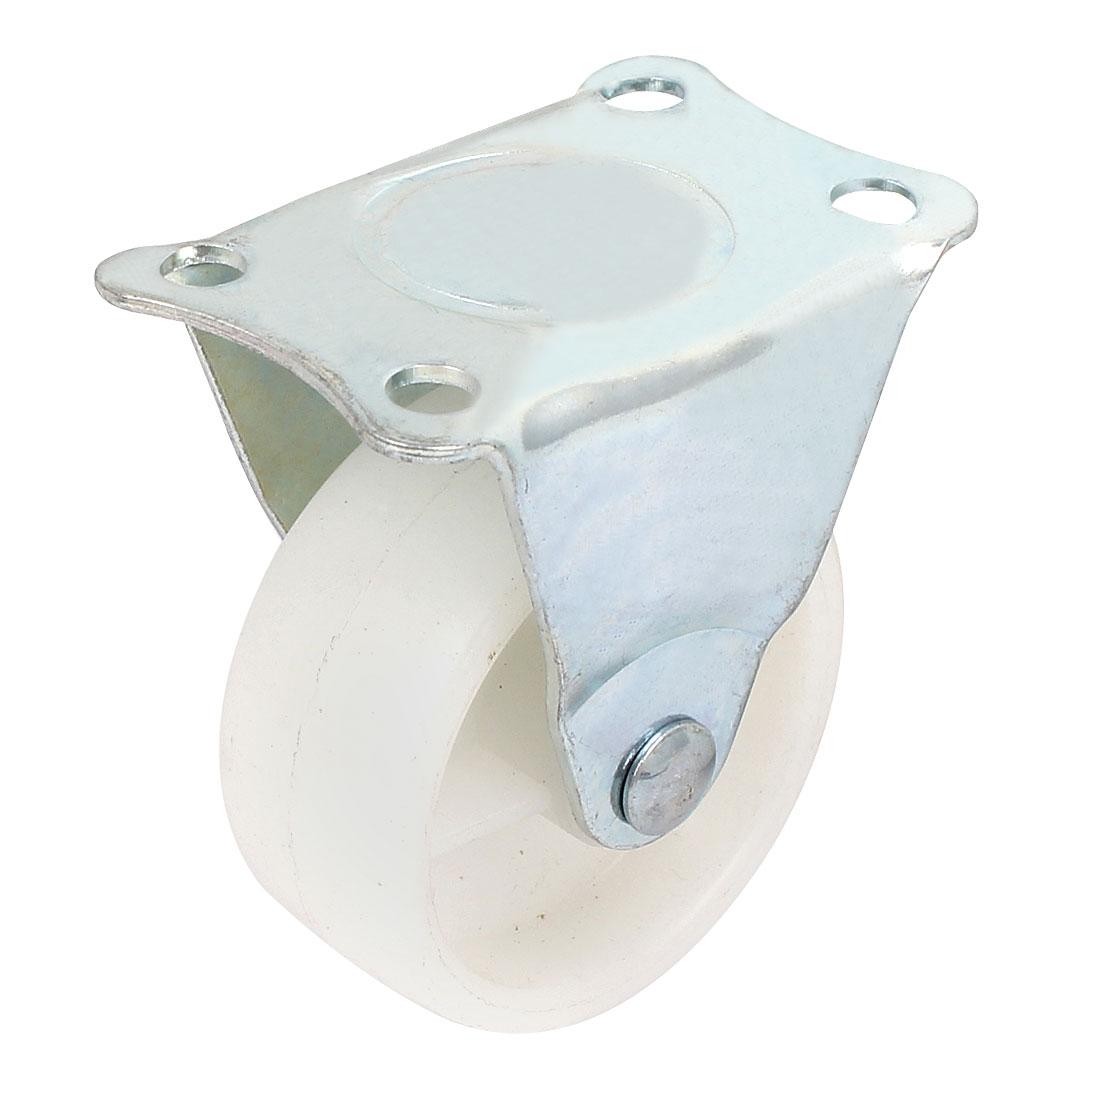 "2"" Swivel Casters Rubber Wheels Metal Top Plate Ball Bearings"